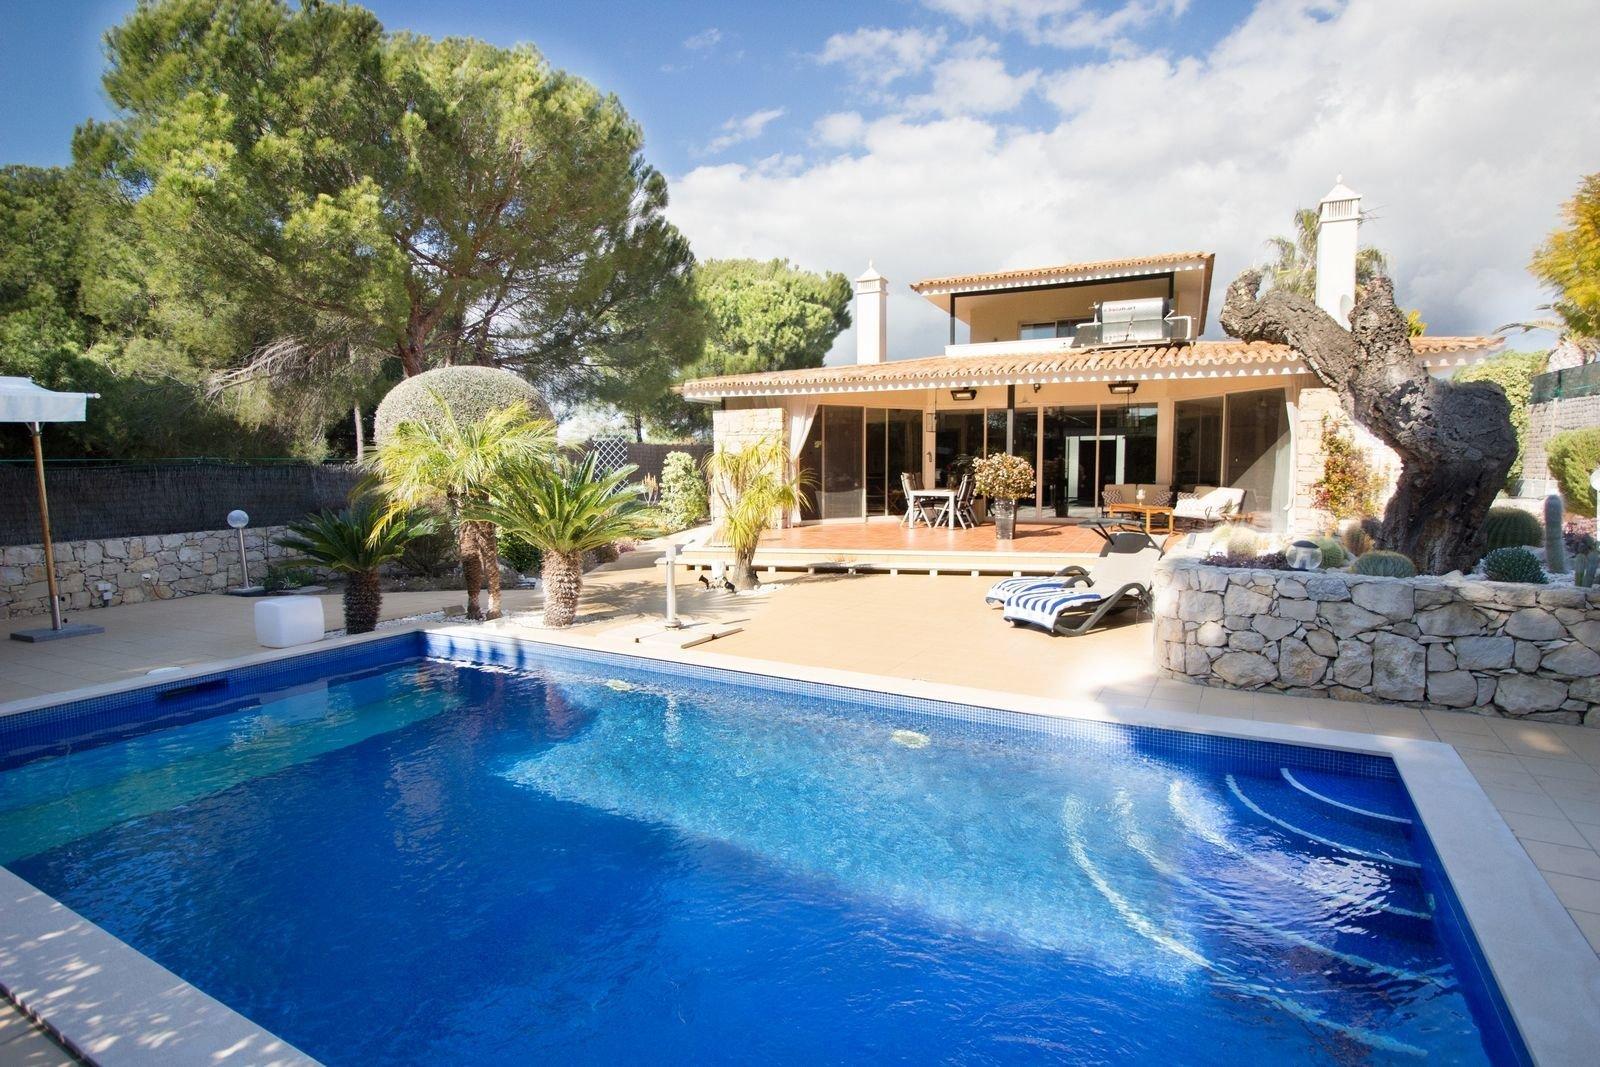 3 Bedroom Villa Almancil, Central Algarve Ref: PV3330